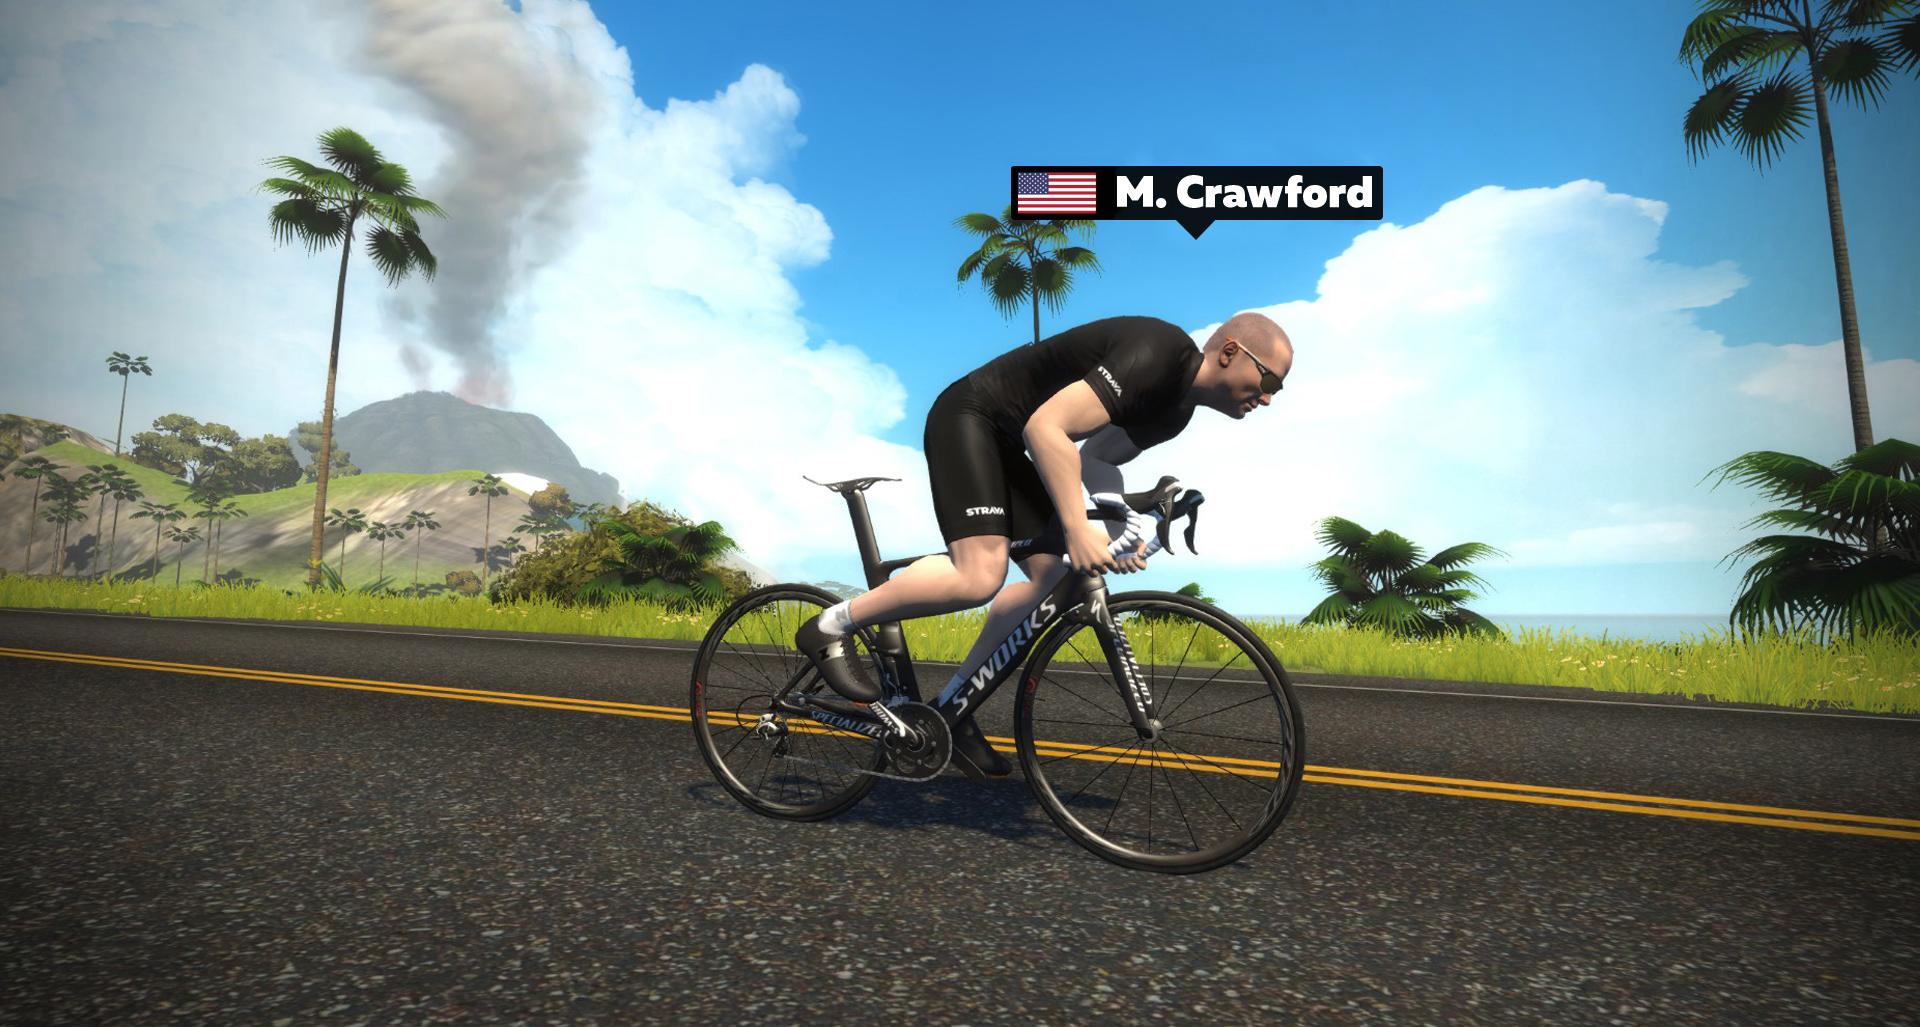 M. Crawford